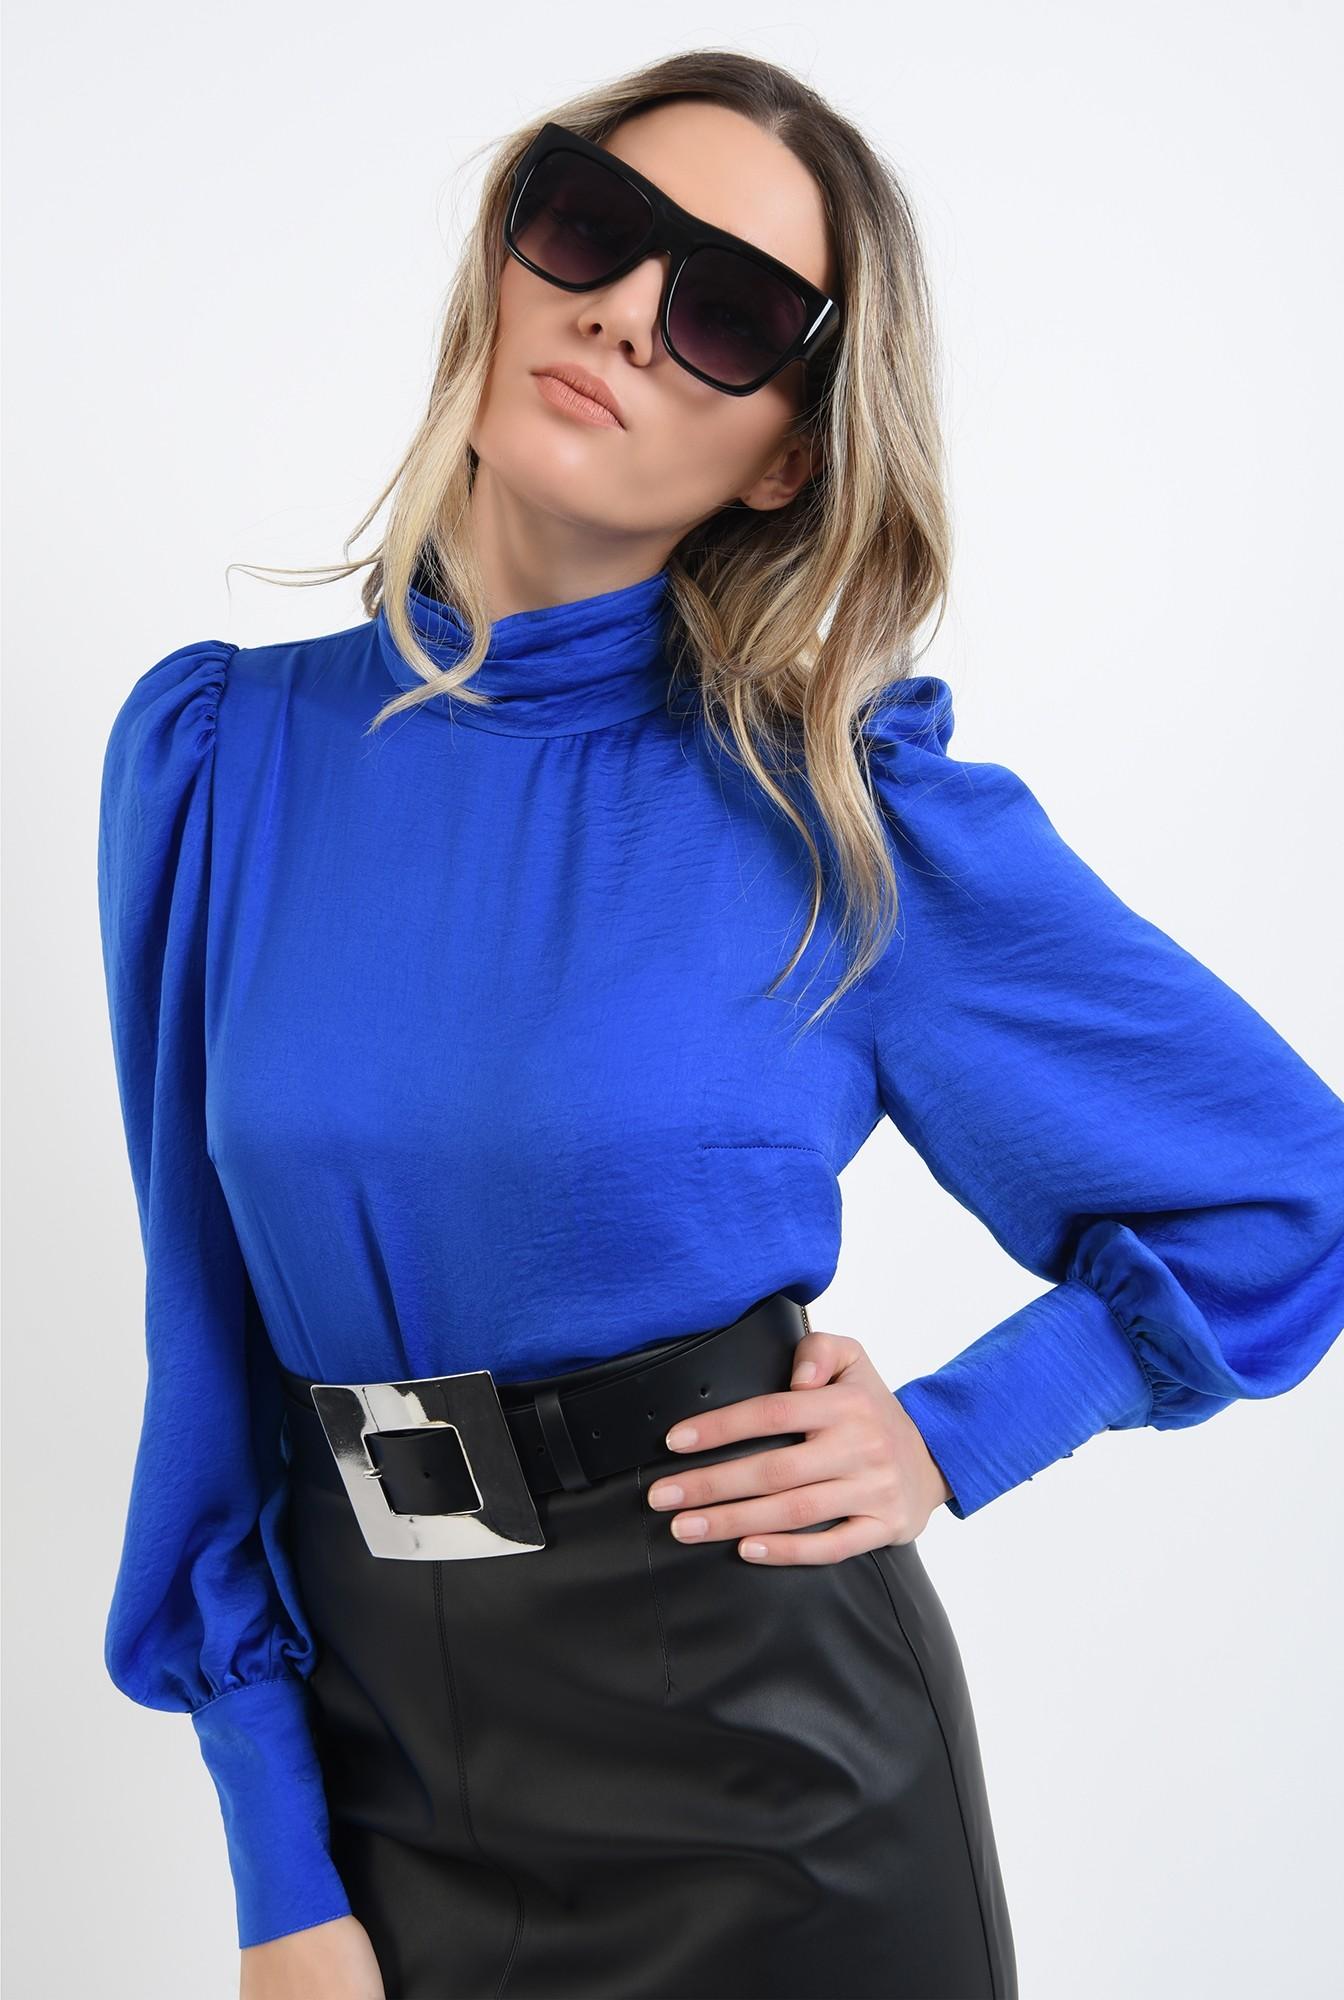 2 - 360 - bluza cu pliuri la gat, albastra, cu nasturi la manseta